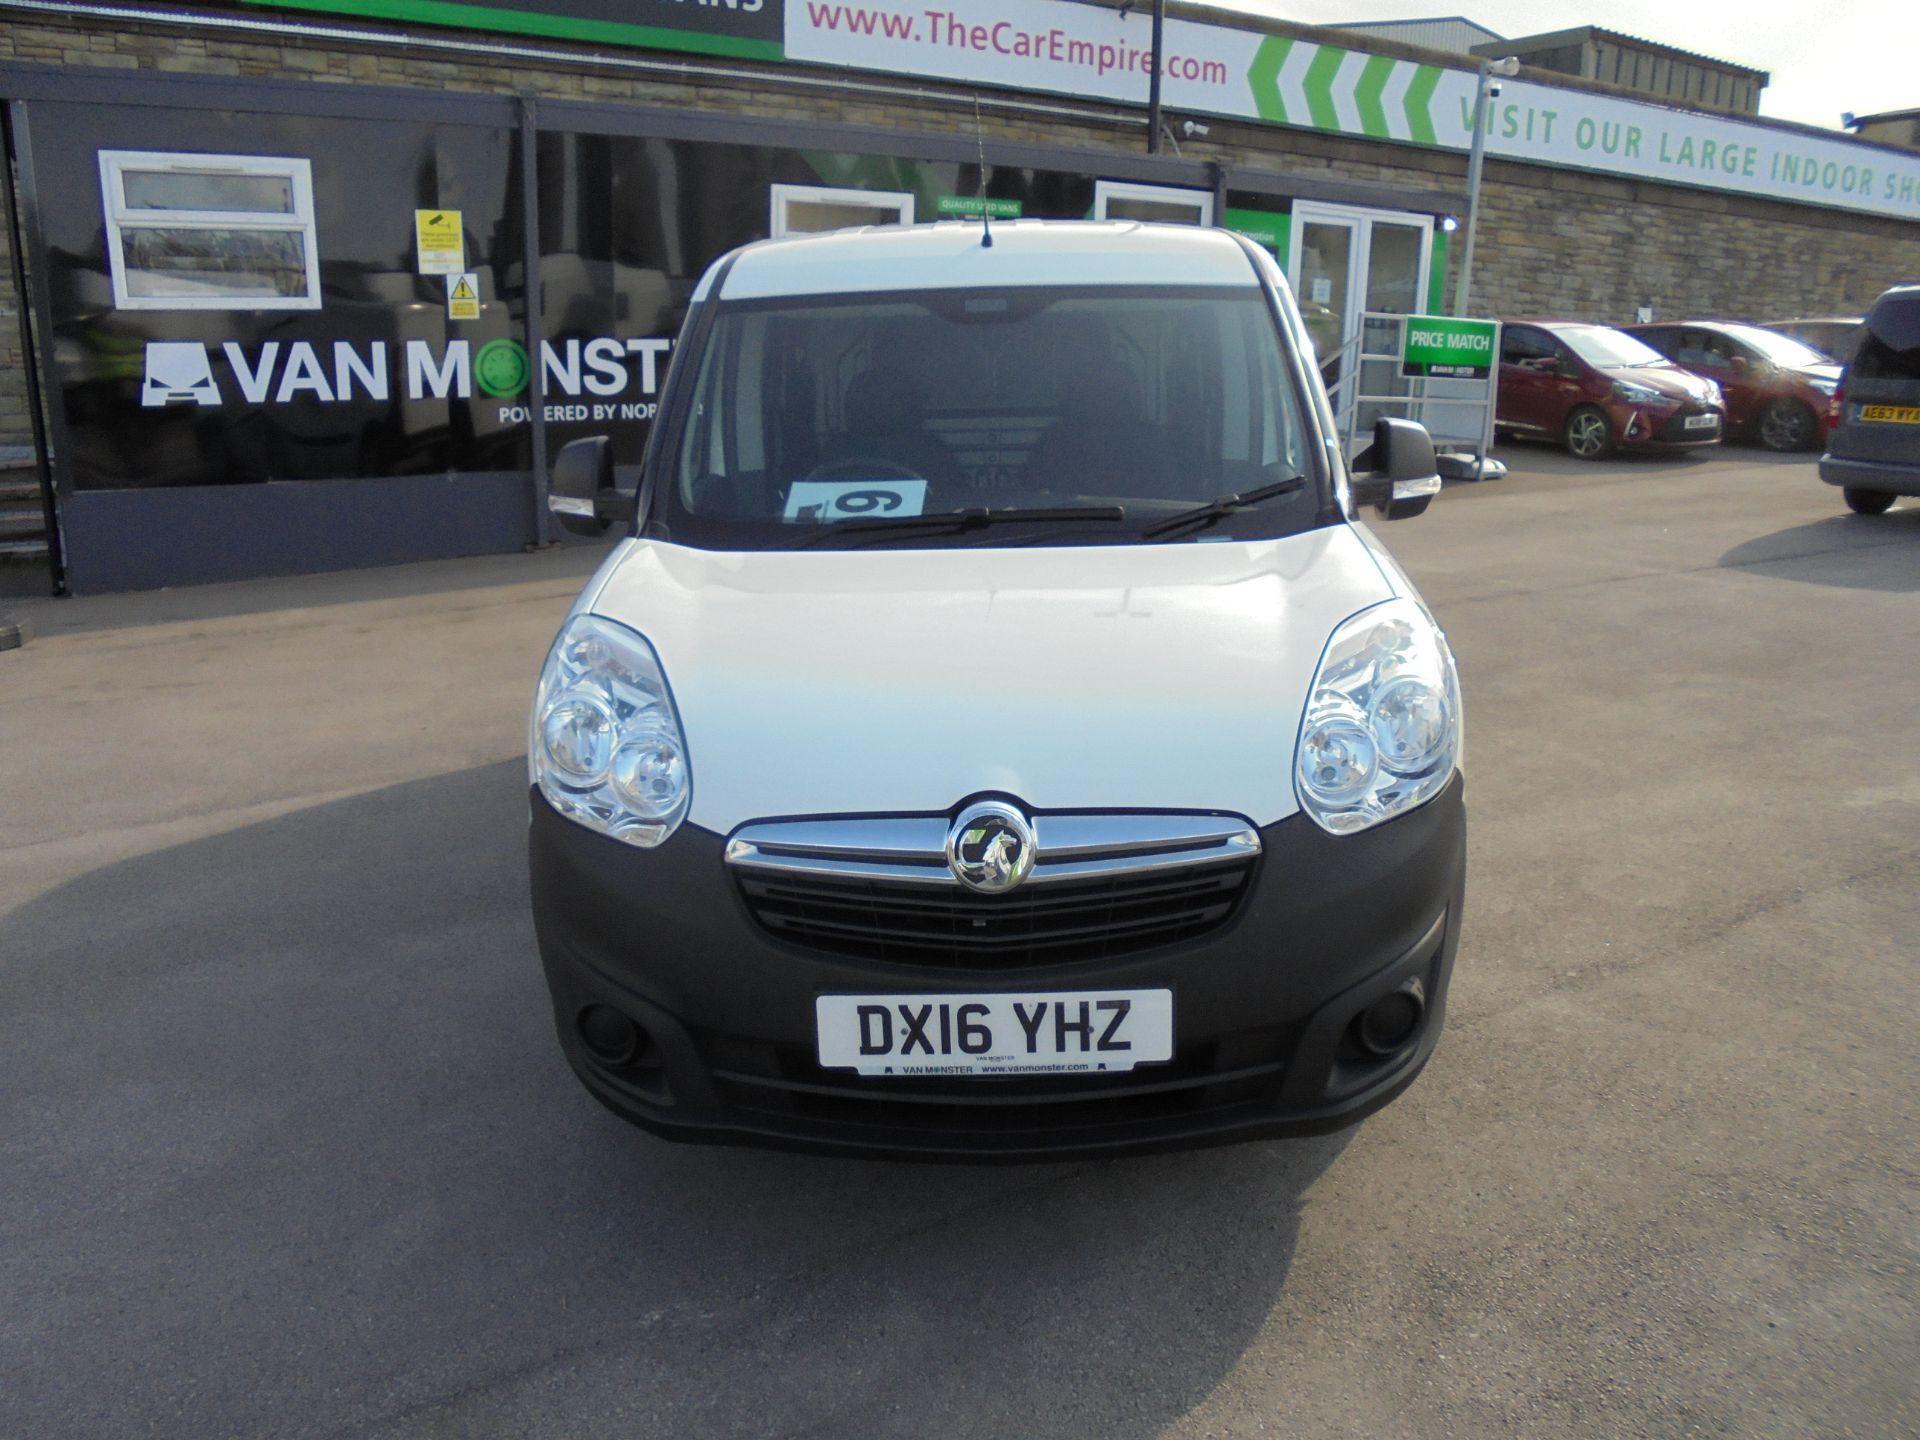 2016 Vauxhall Combo 2000 1.3 Cdti 16V H1 Van (DX16YHZ) Image 2